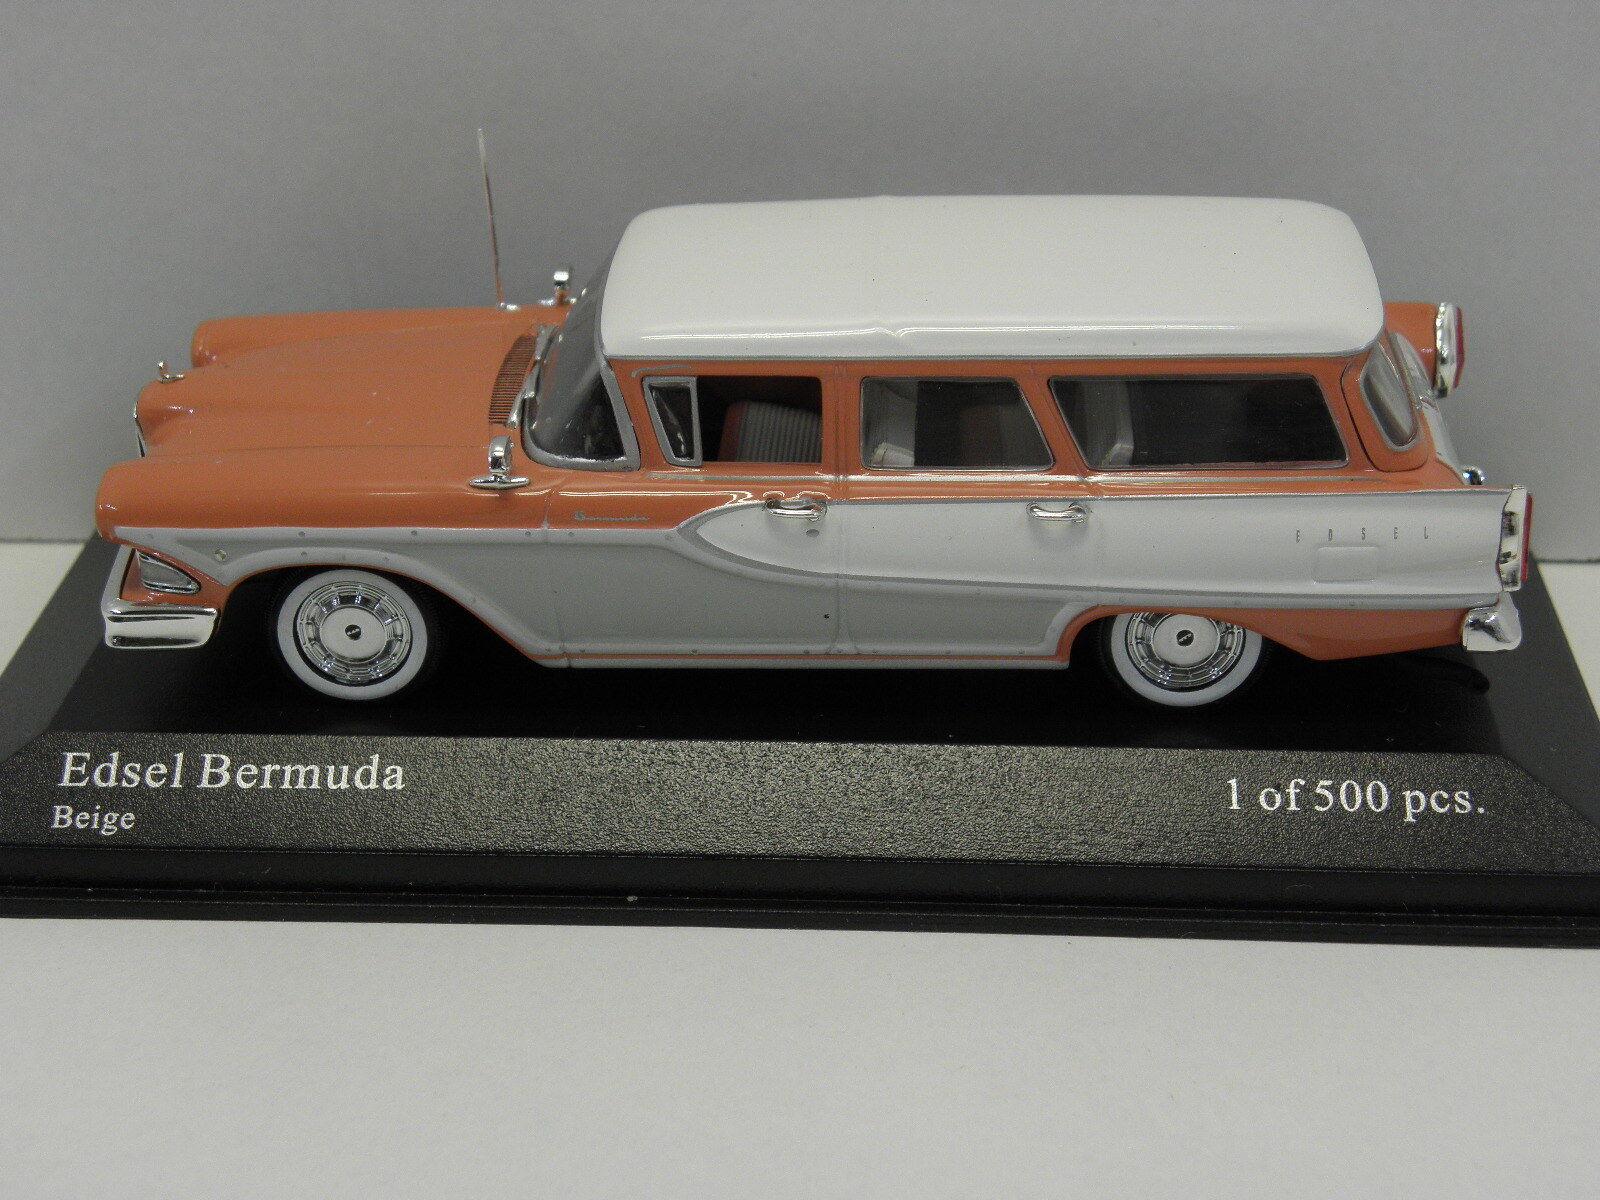 MINICHAMPS 400082012 sammelmodell Edsel Edsel Edsel Bermuda Stationwagon 1958 M .1  43 06b43a